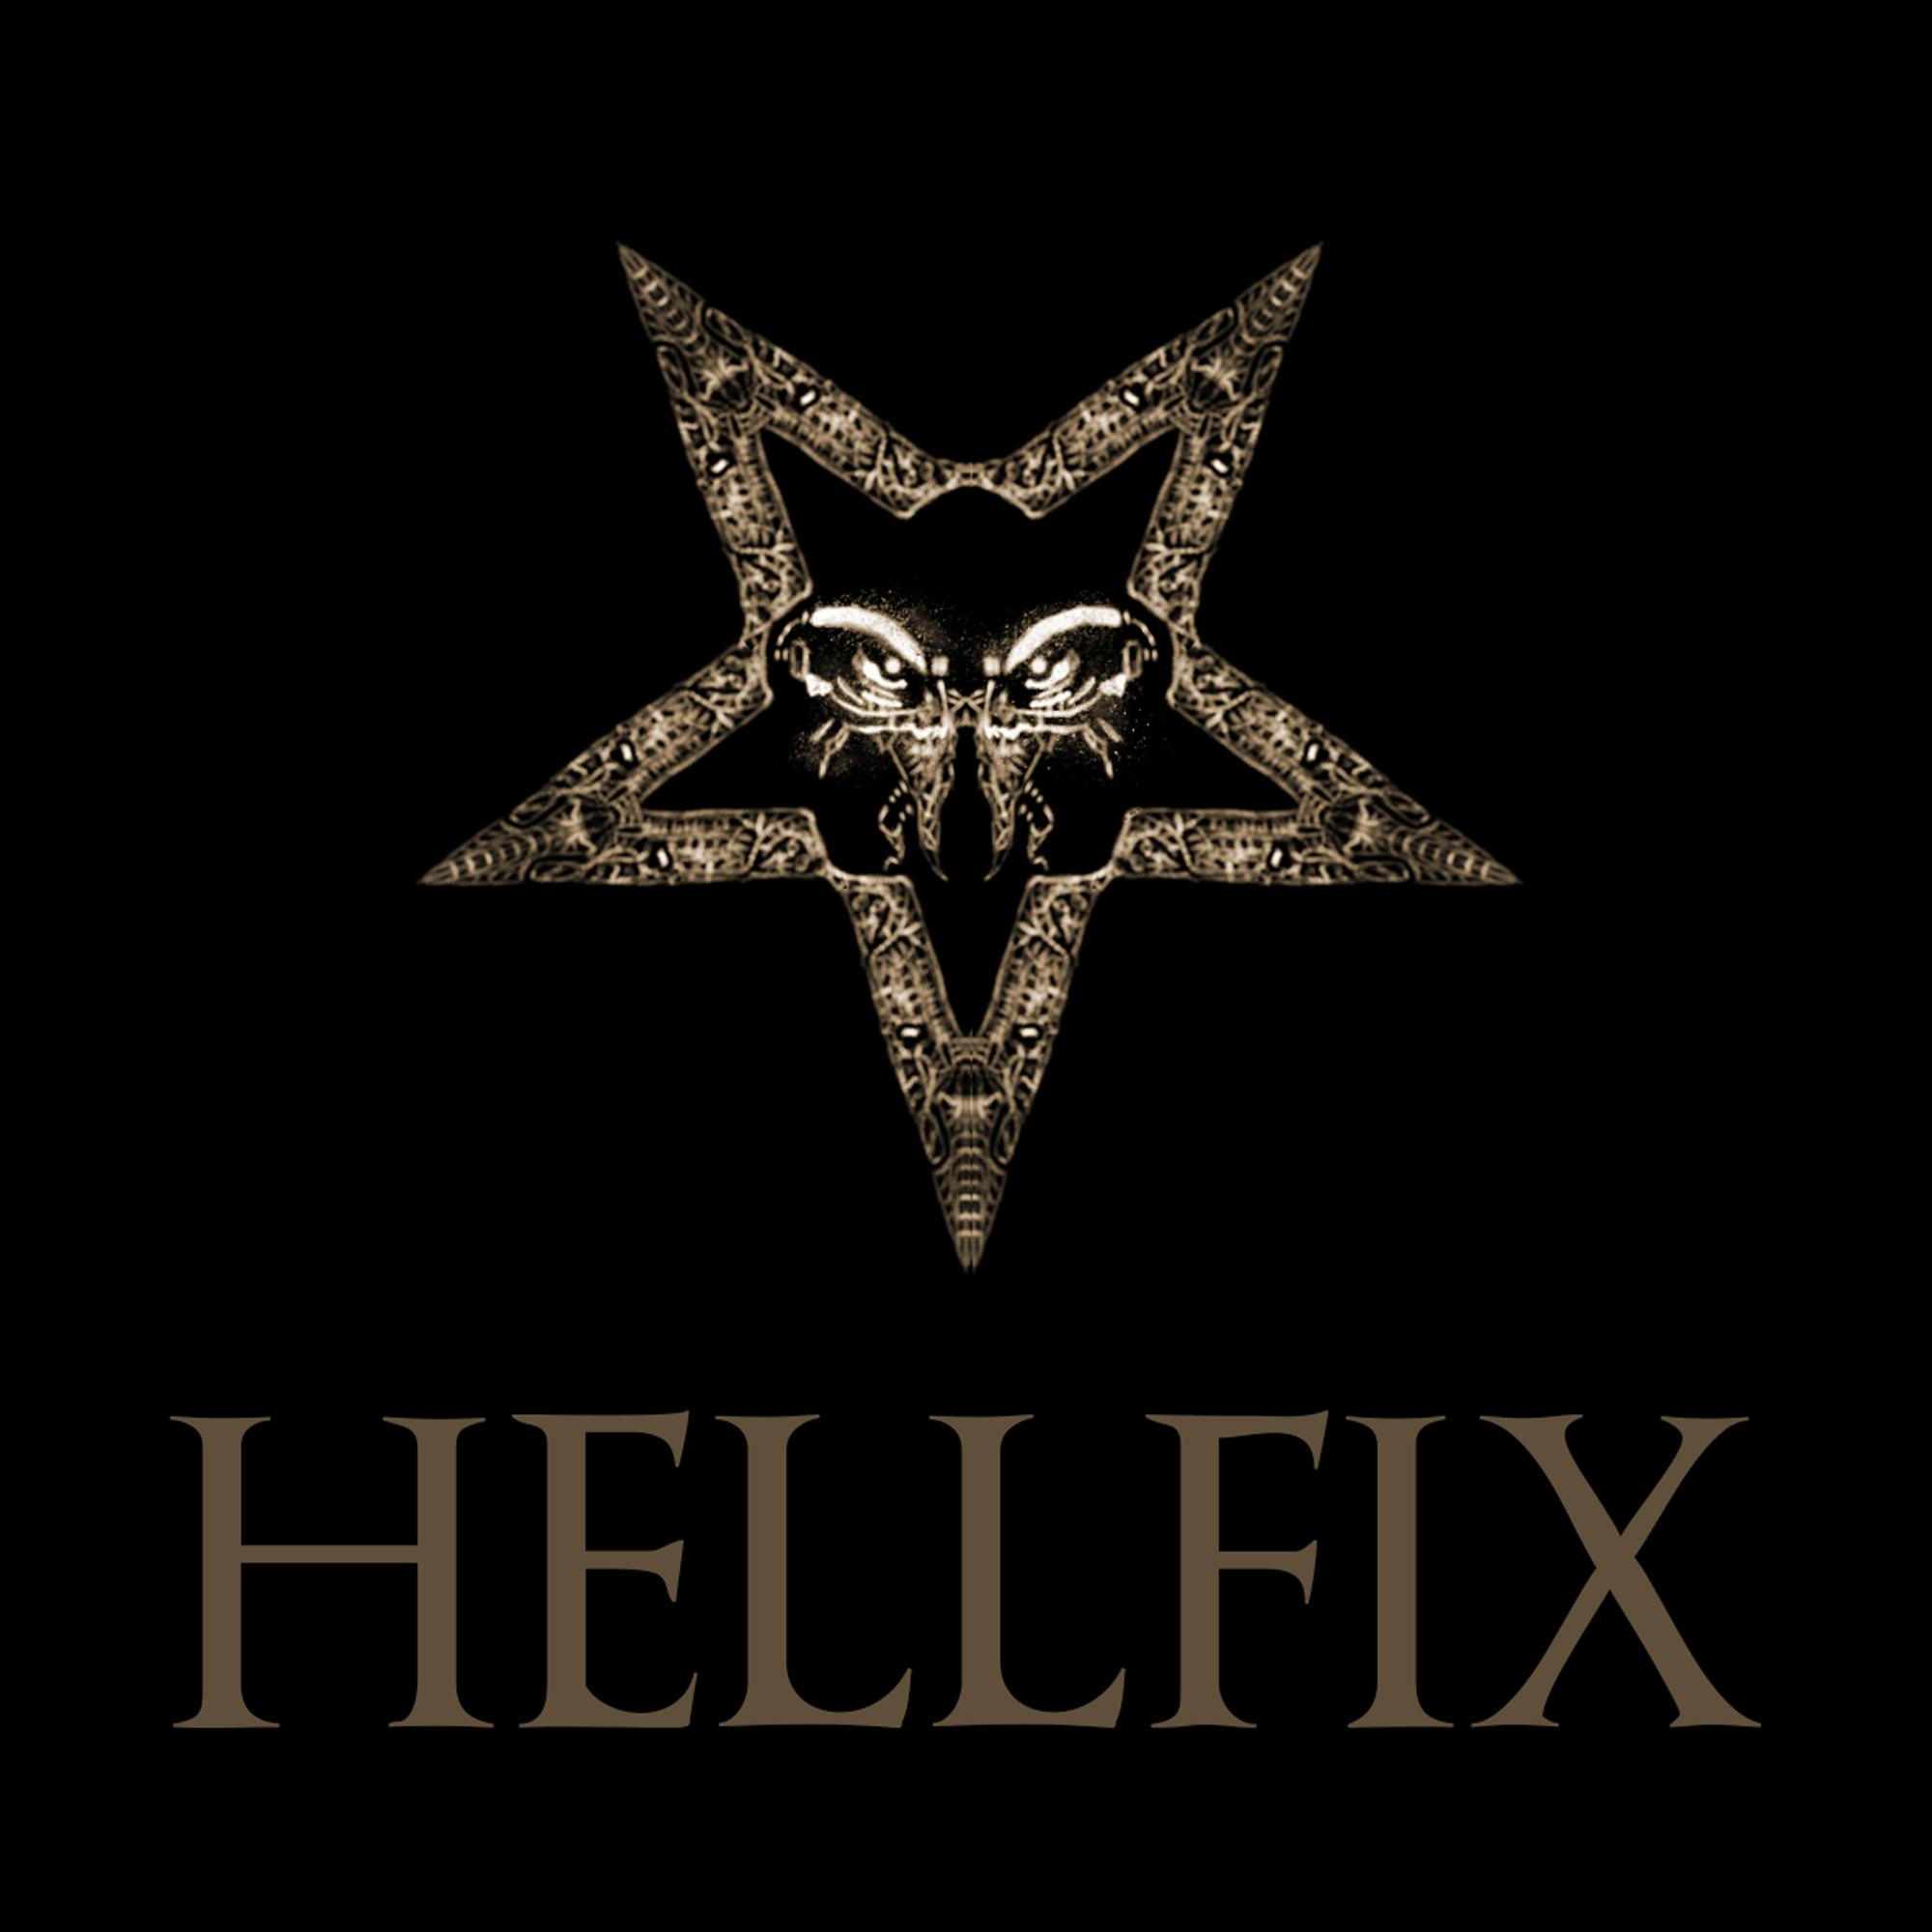 Hellfix